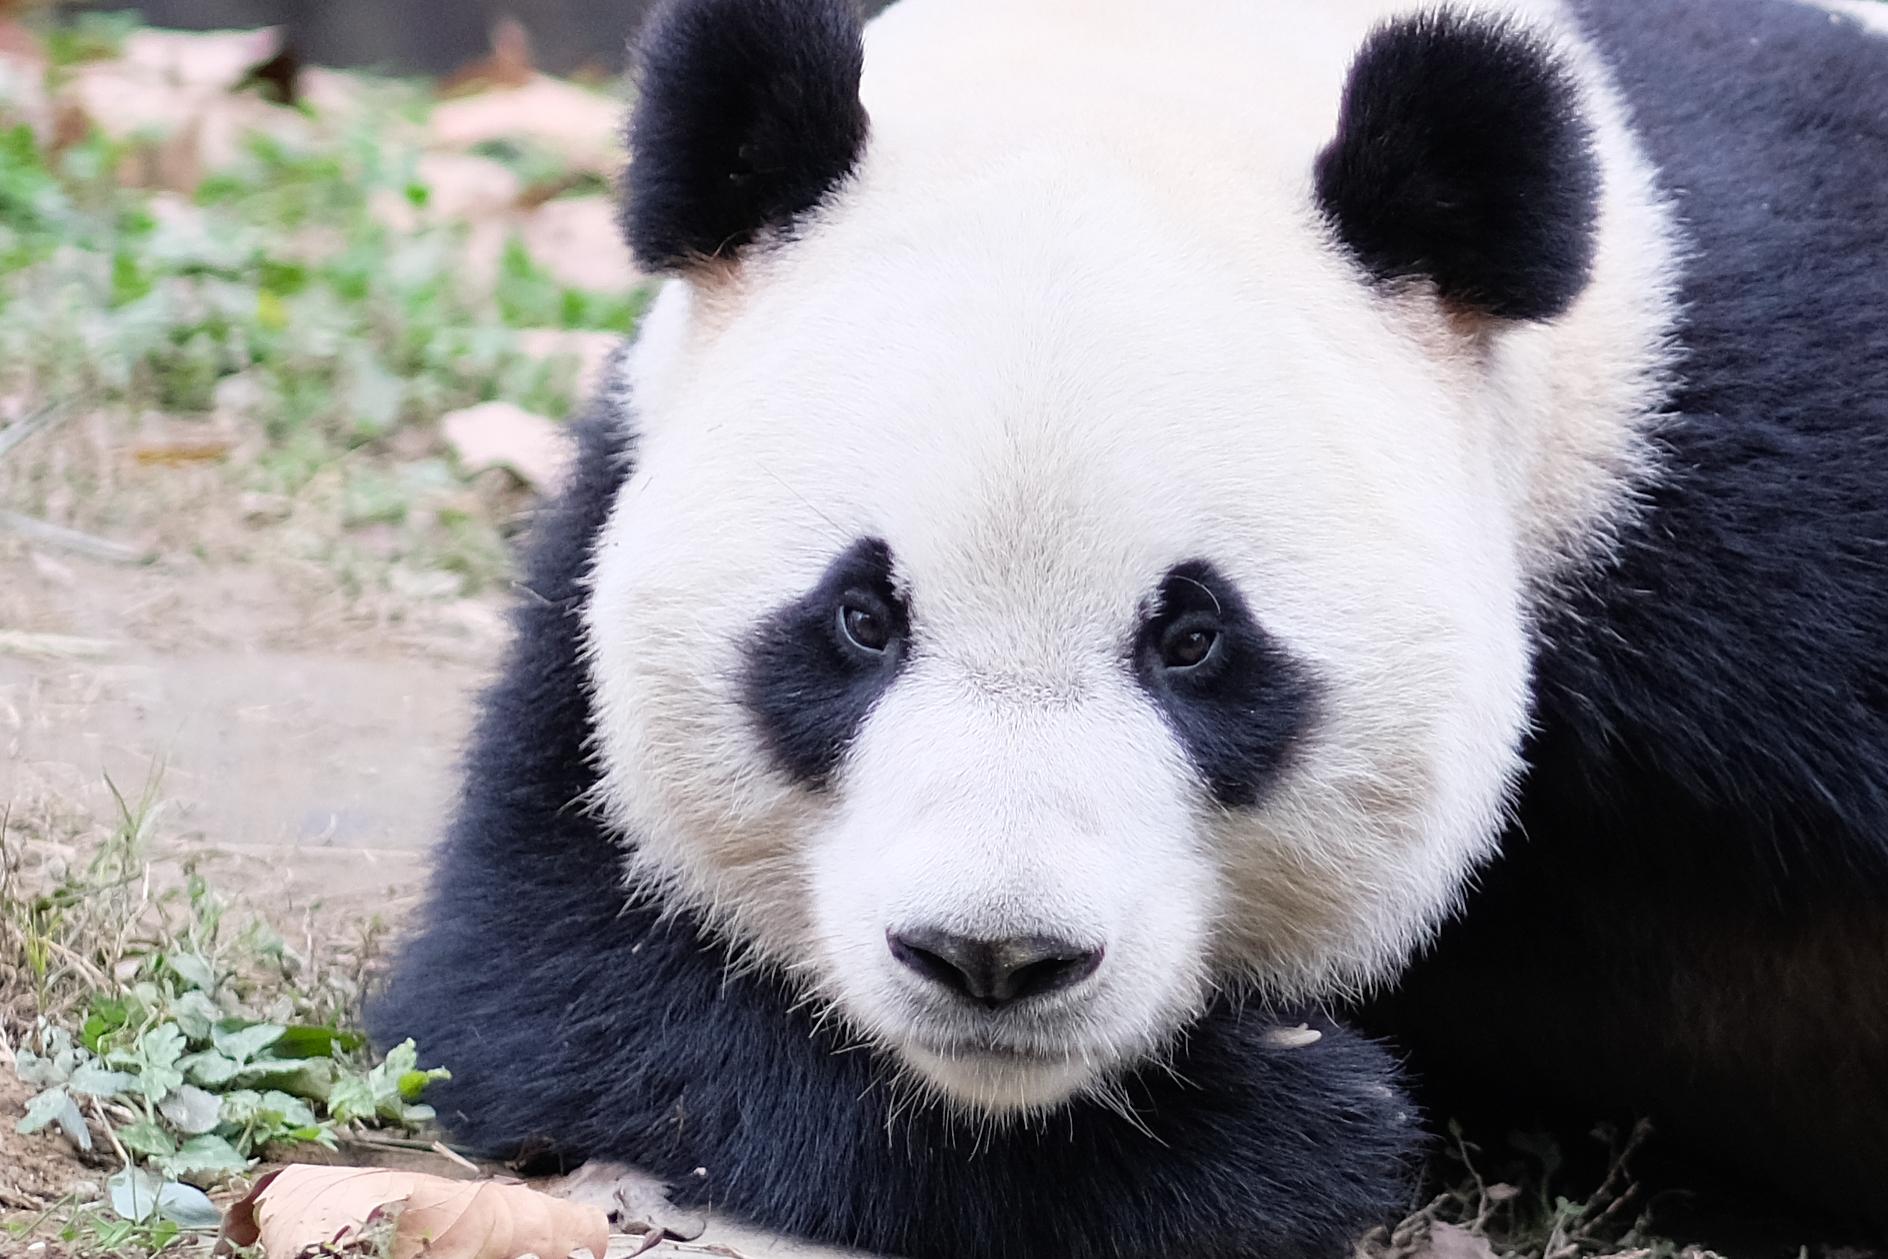 My Dream Job: Panda Keeper at dujiangyan panda base - March 4th, 2017